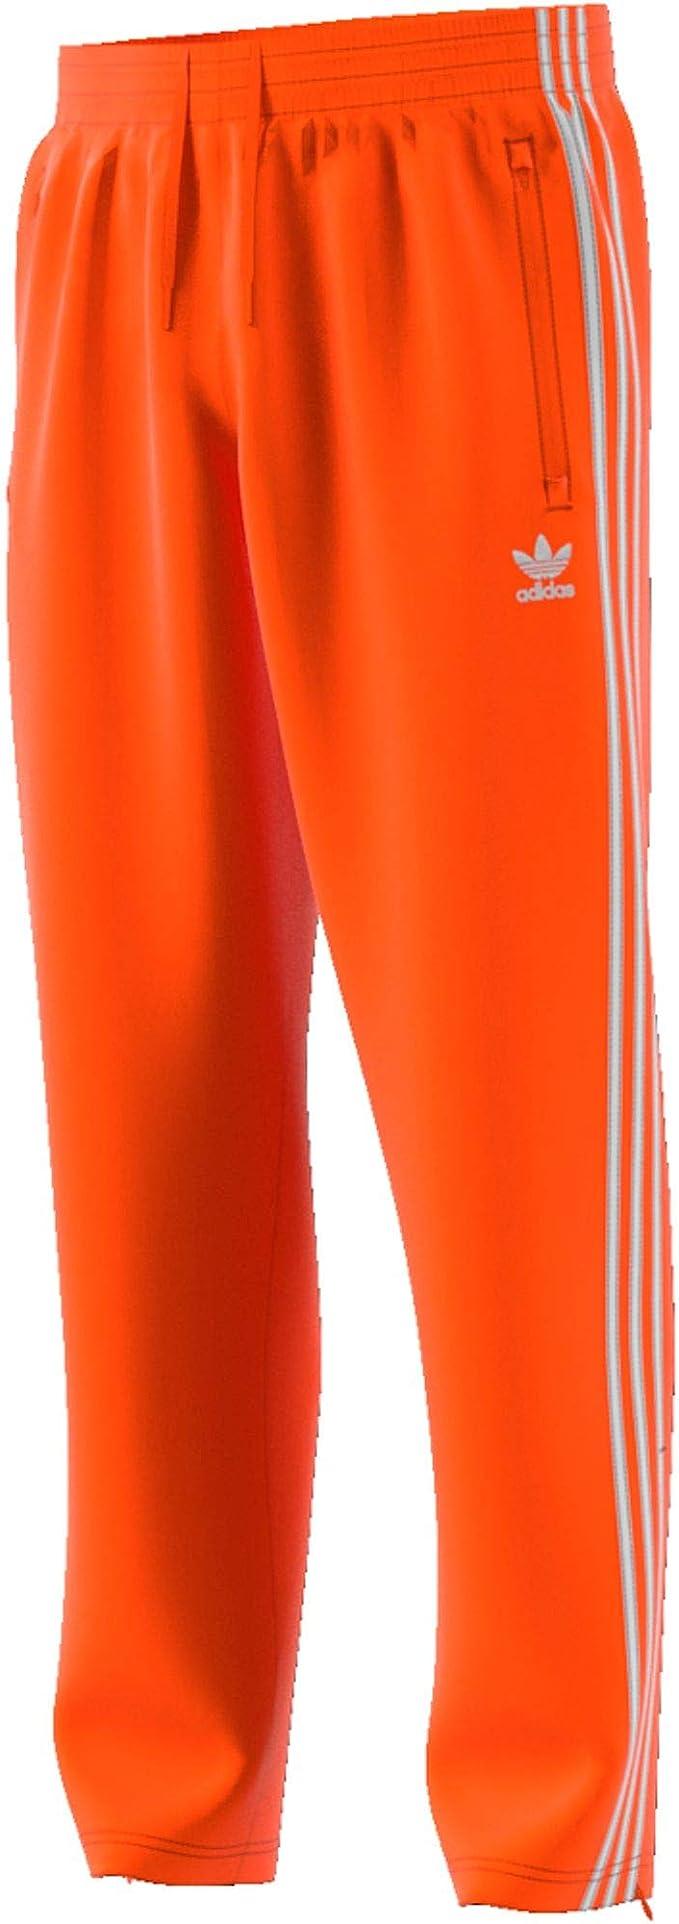 survetement adidas homme orange - 53% remise